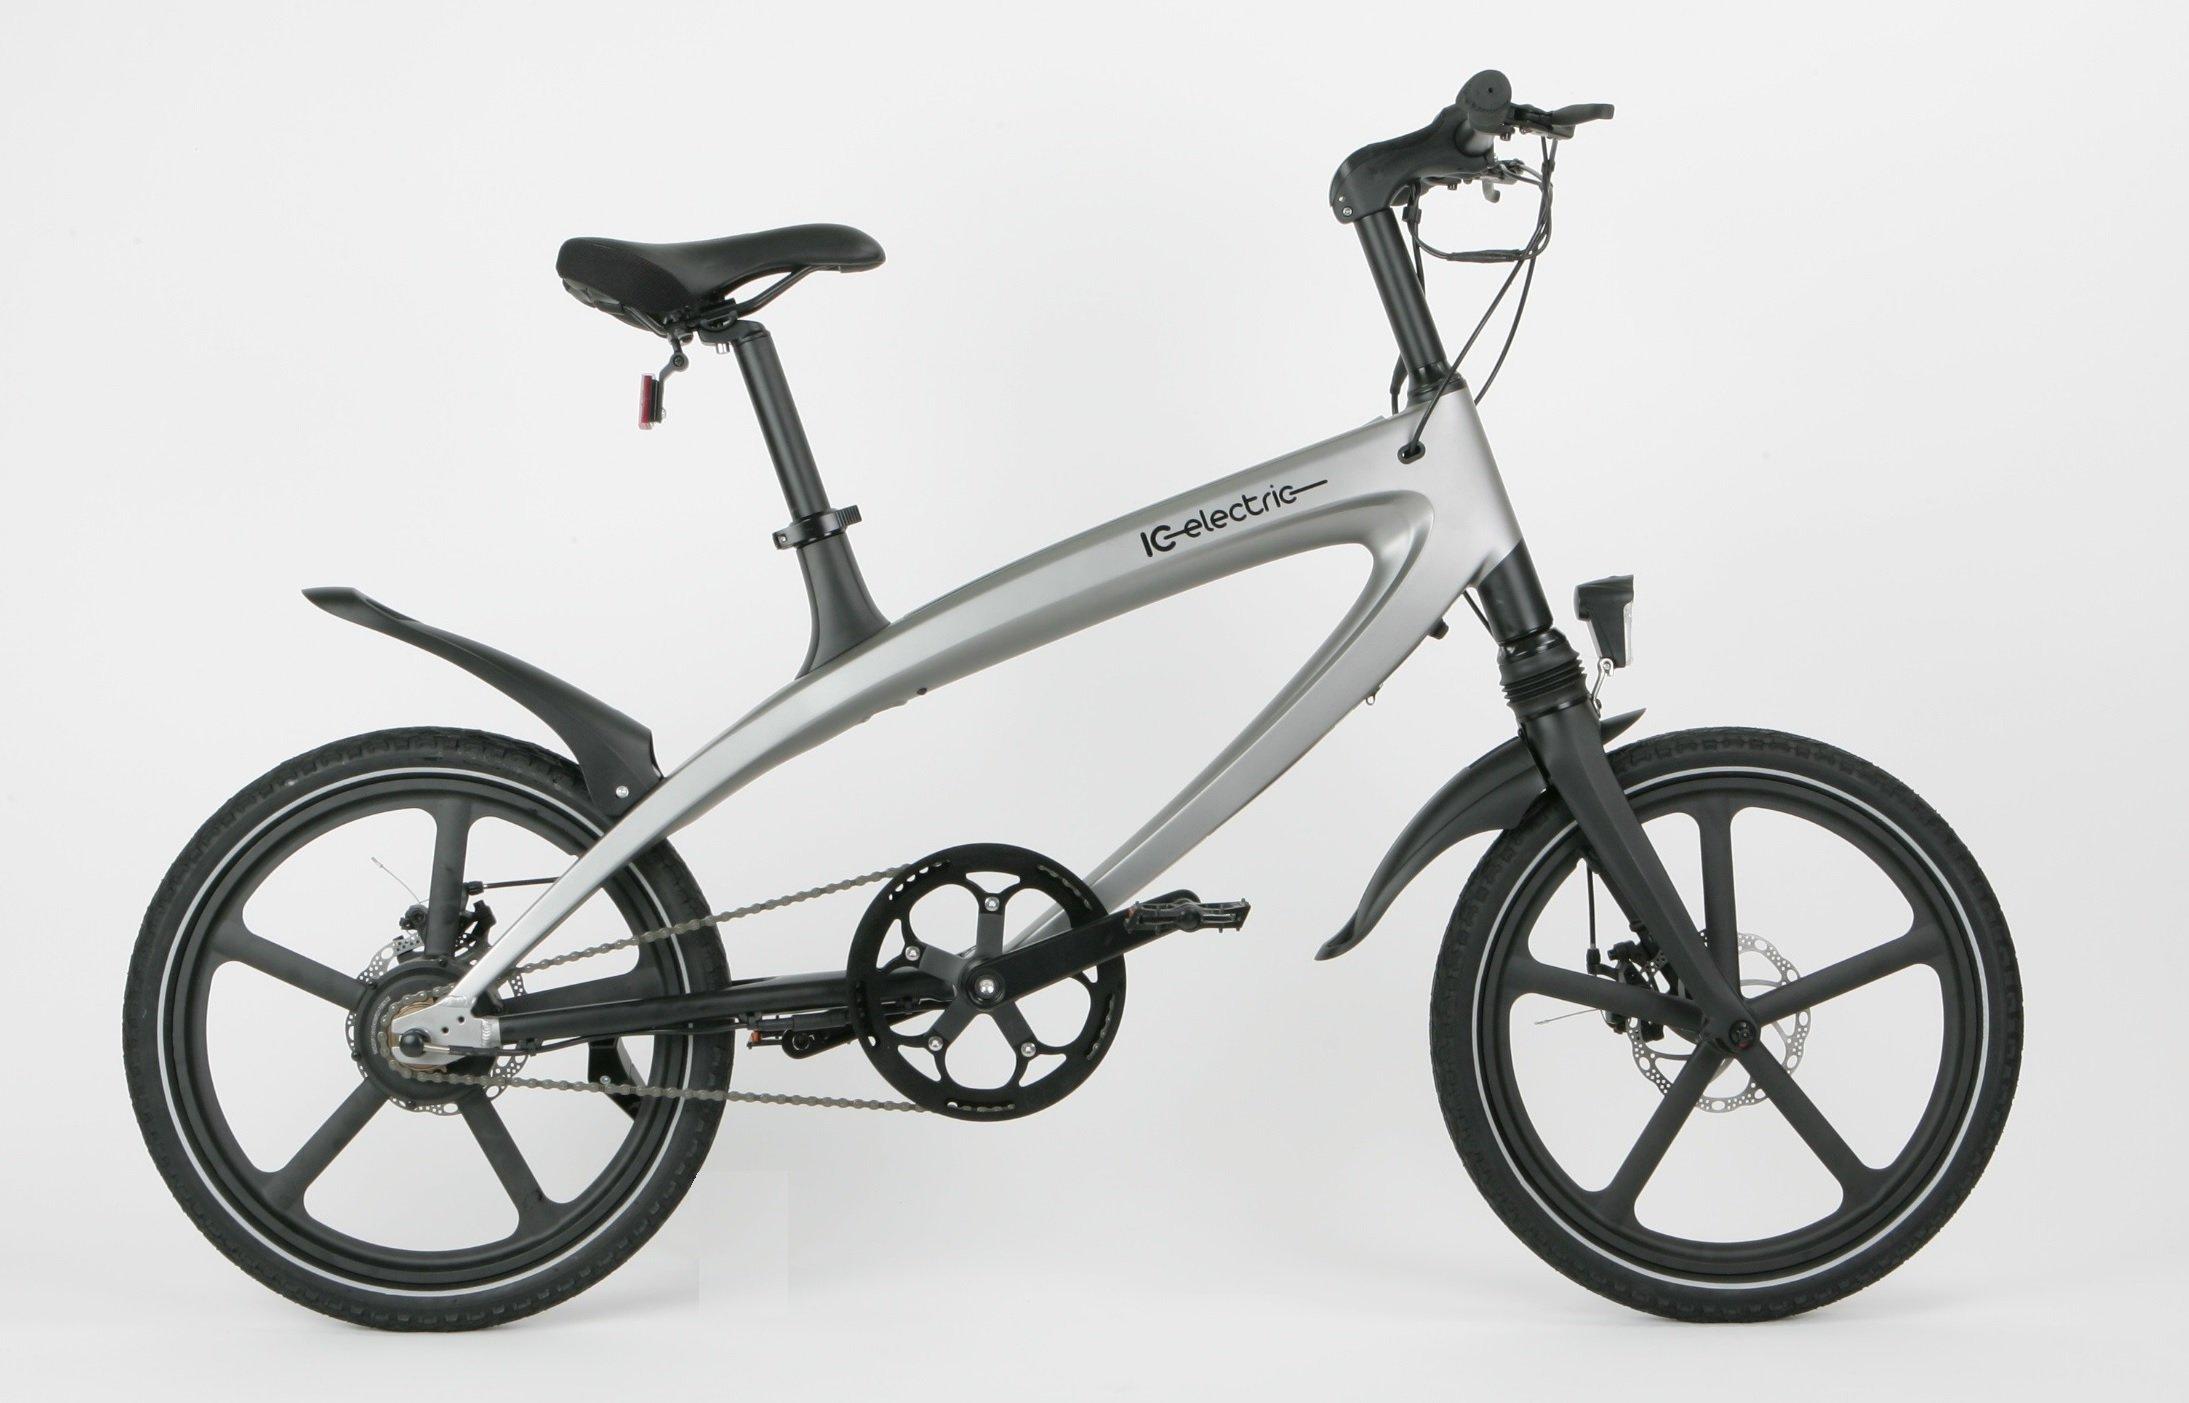 Bicicleta eléctrica Alfa de IC Electric